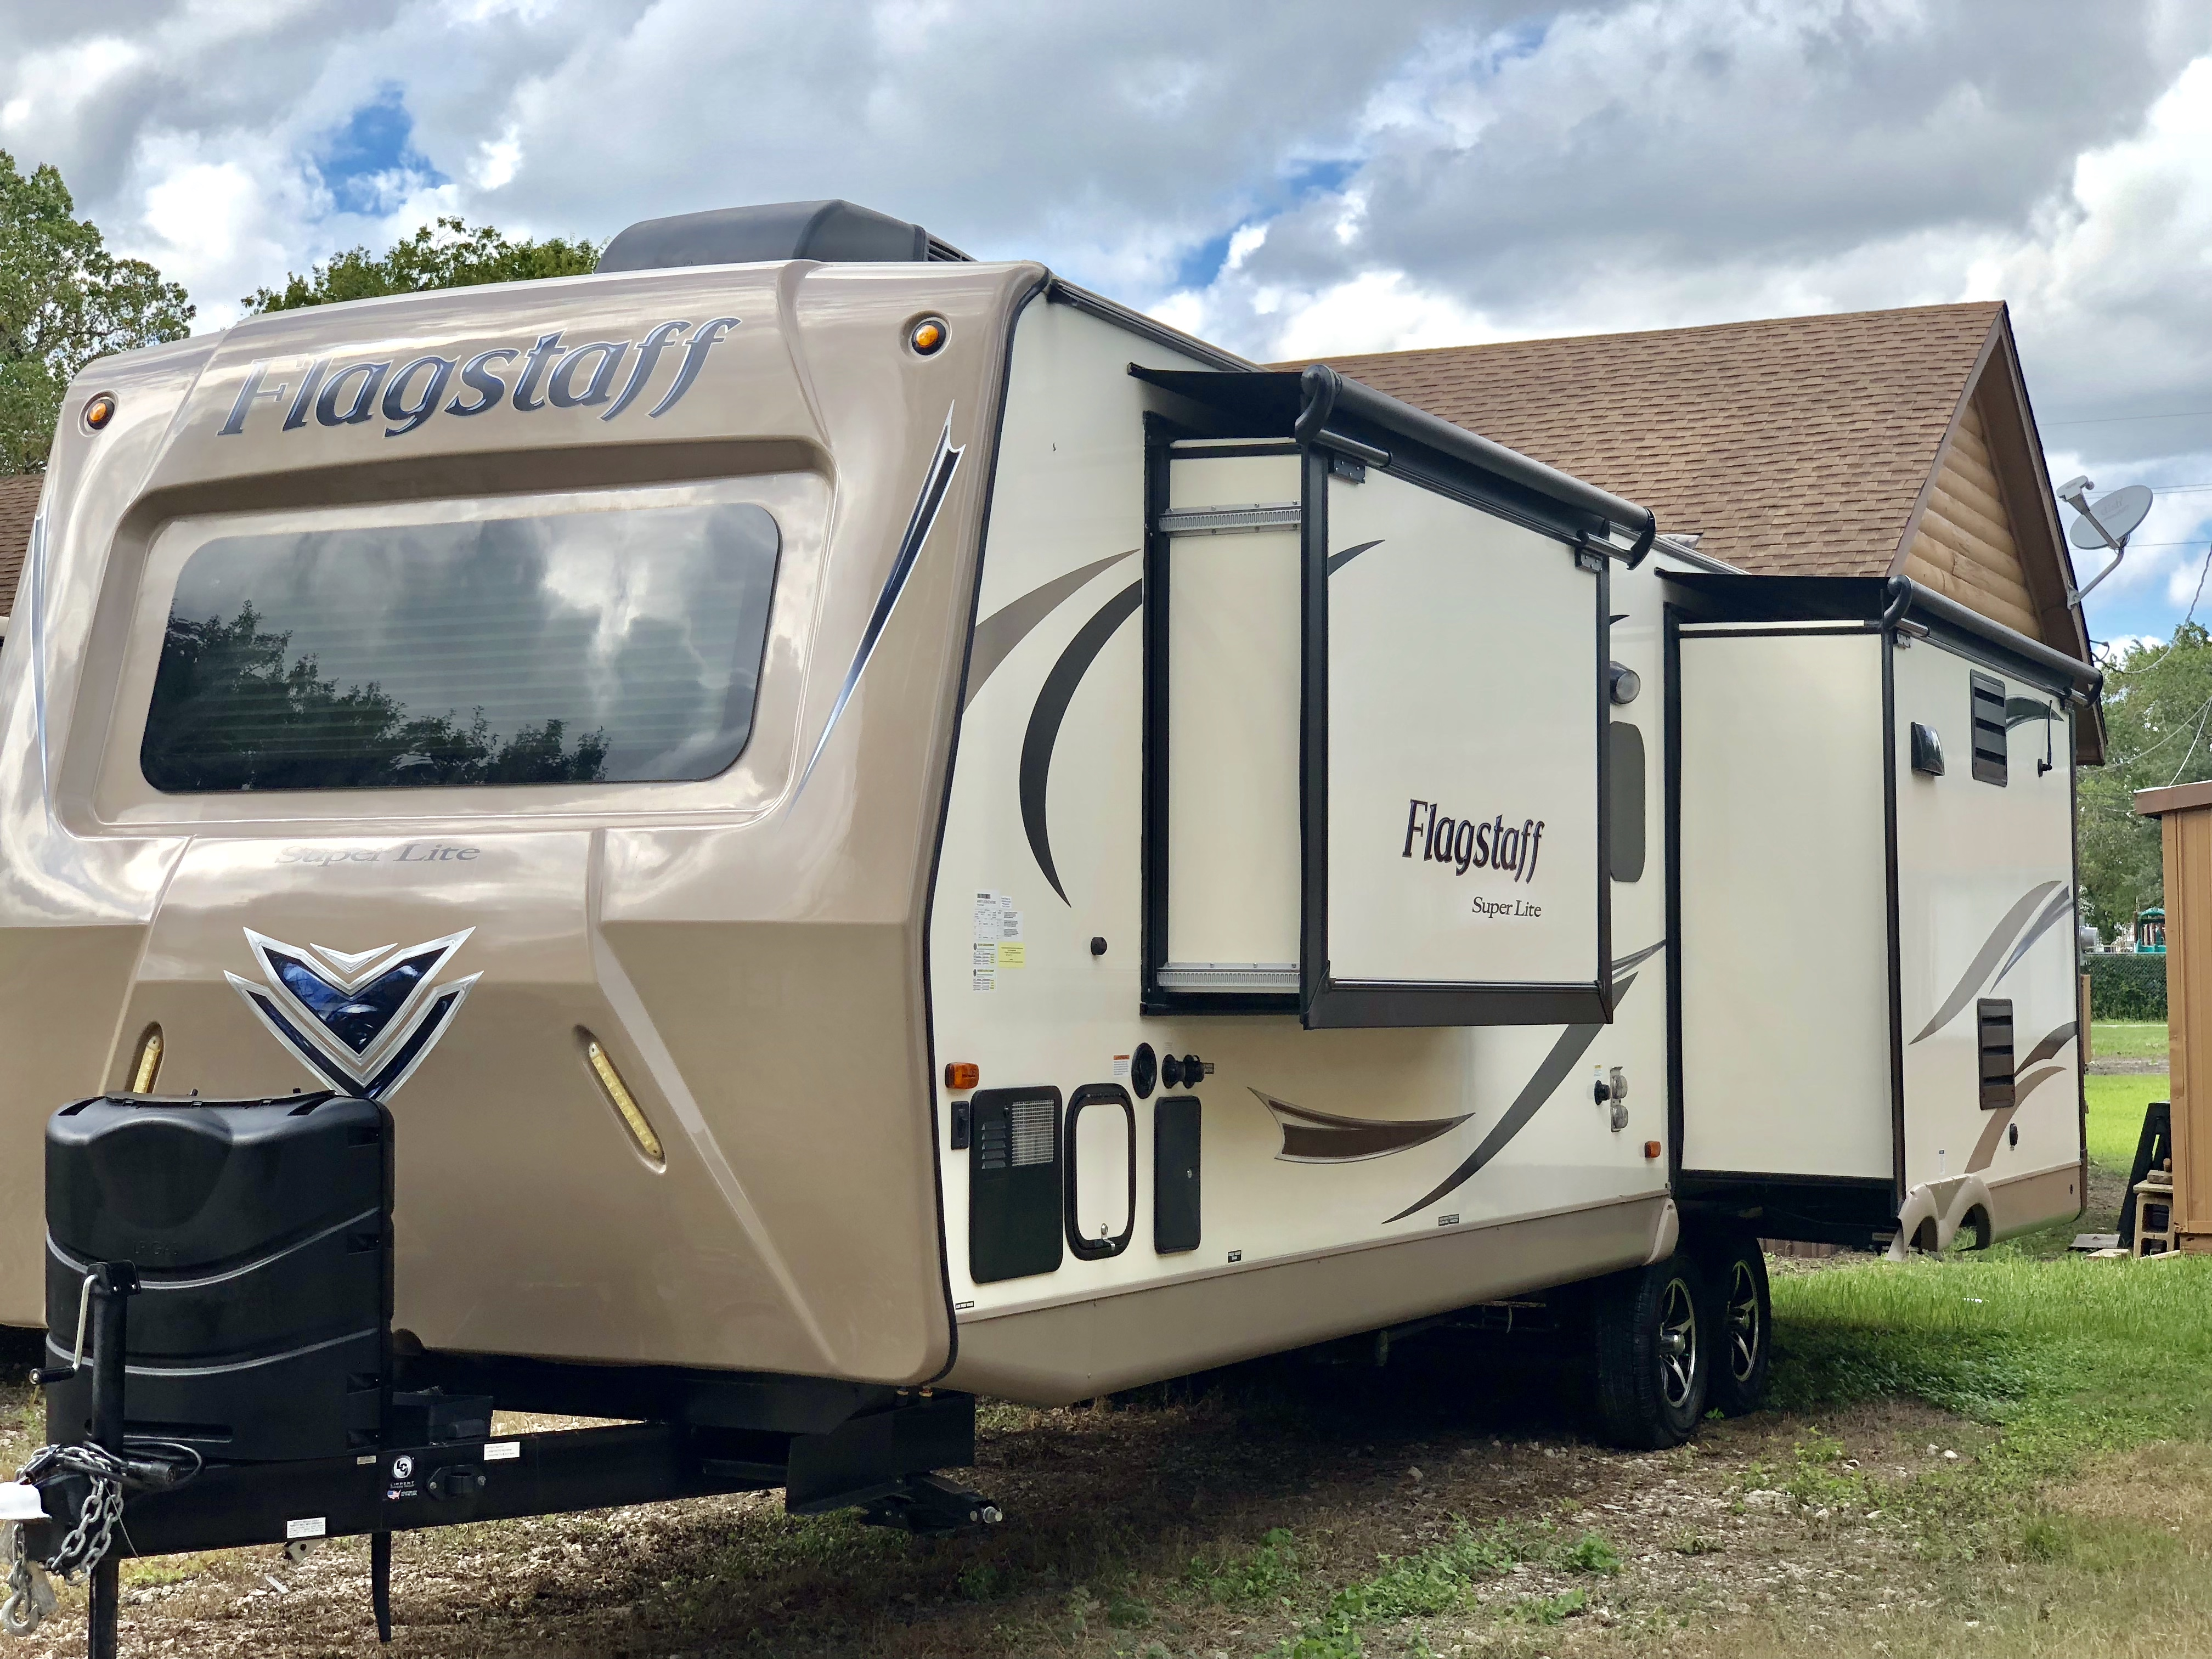 2017 Flagstaff Super Lite By Forestriver Travel